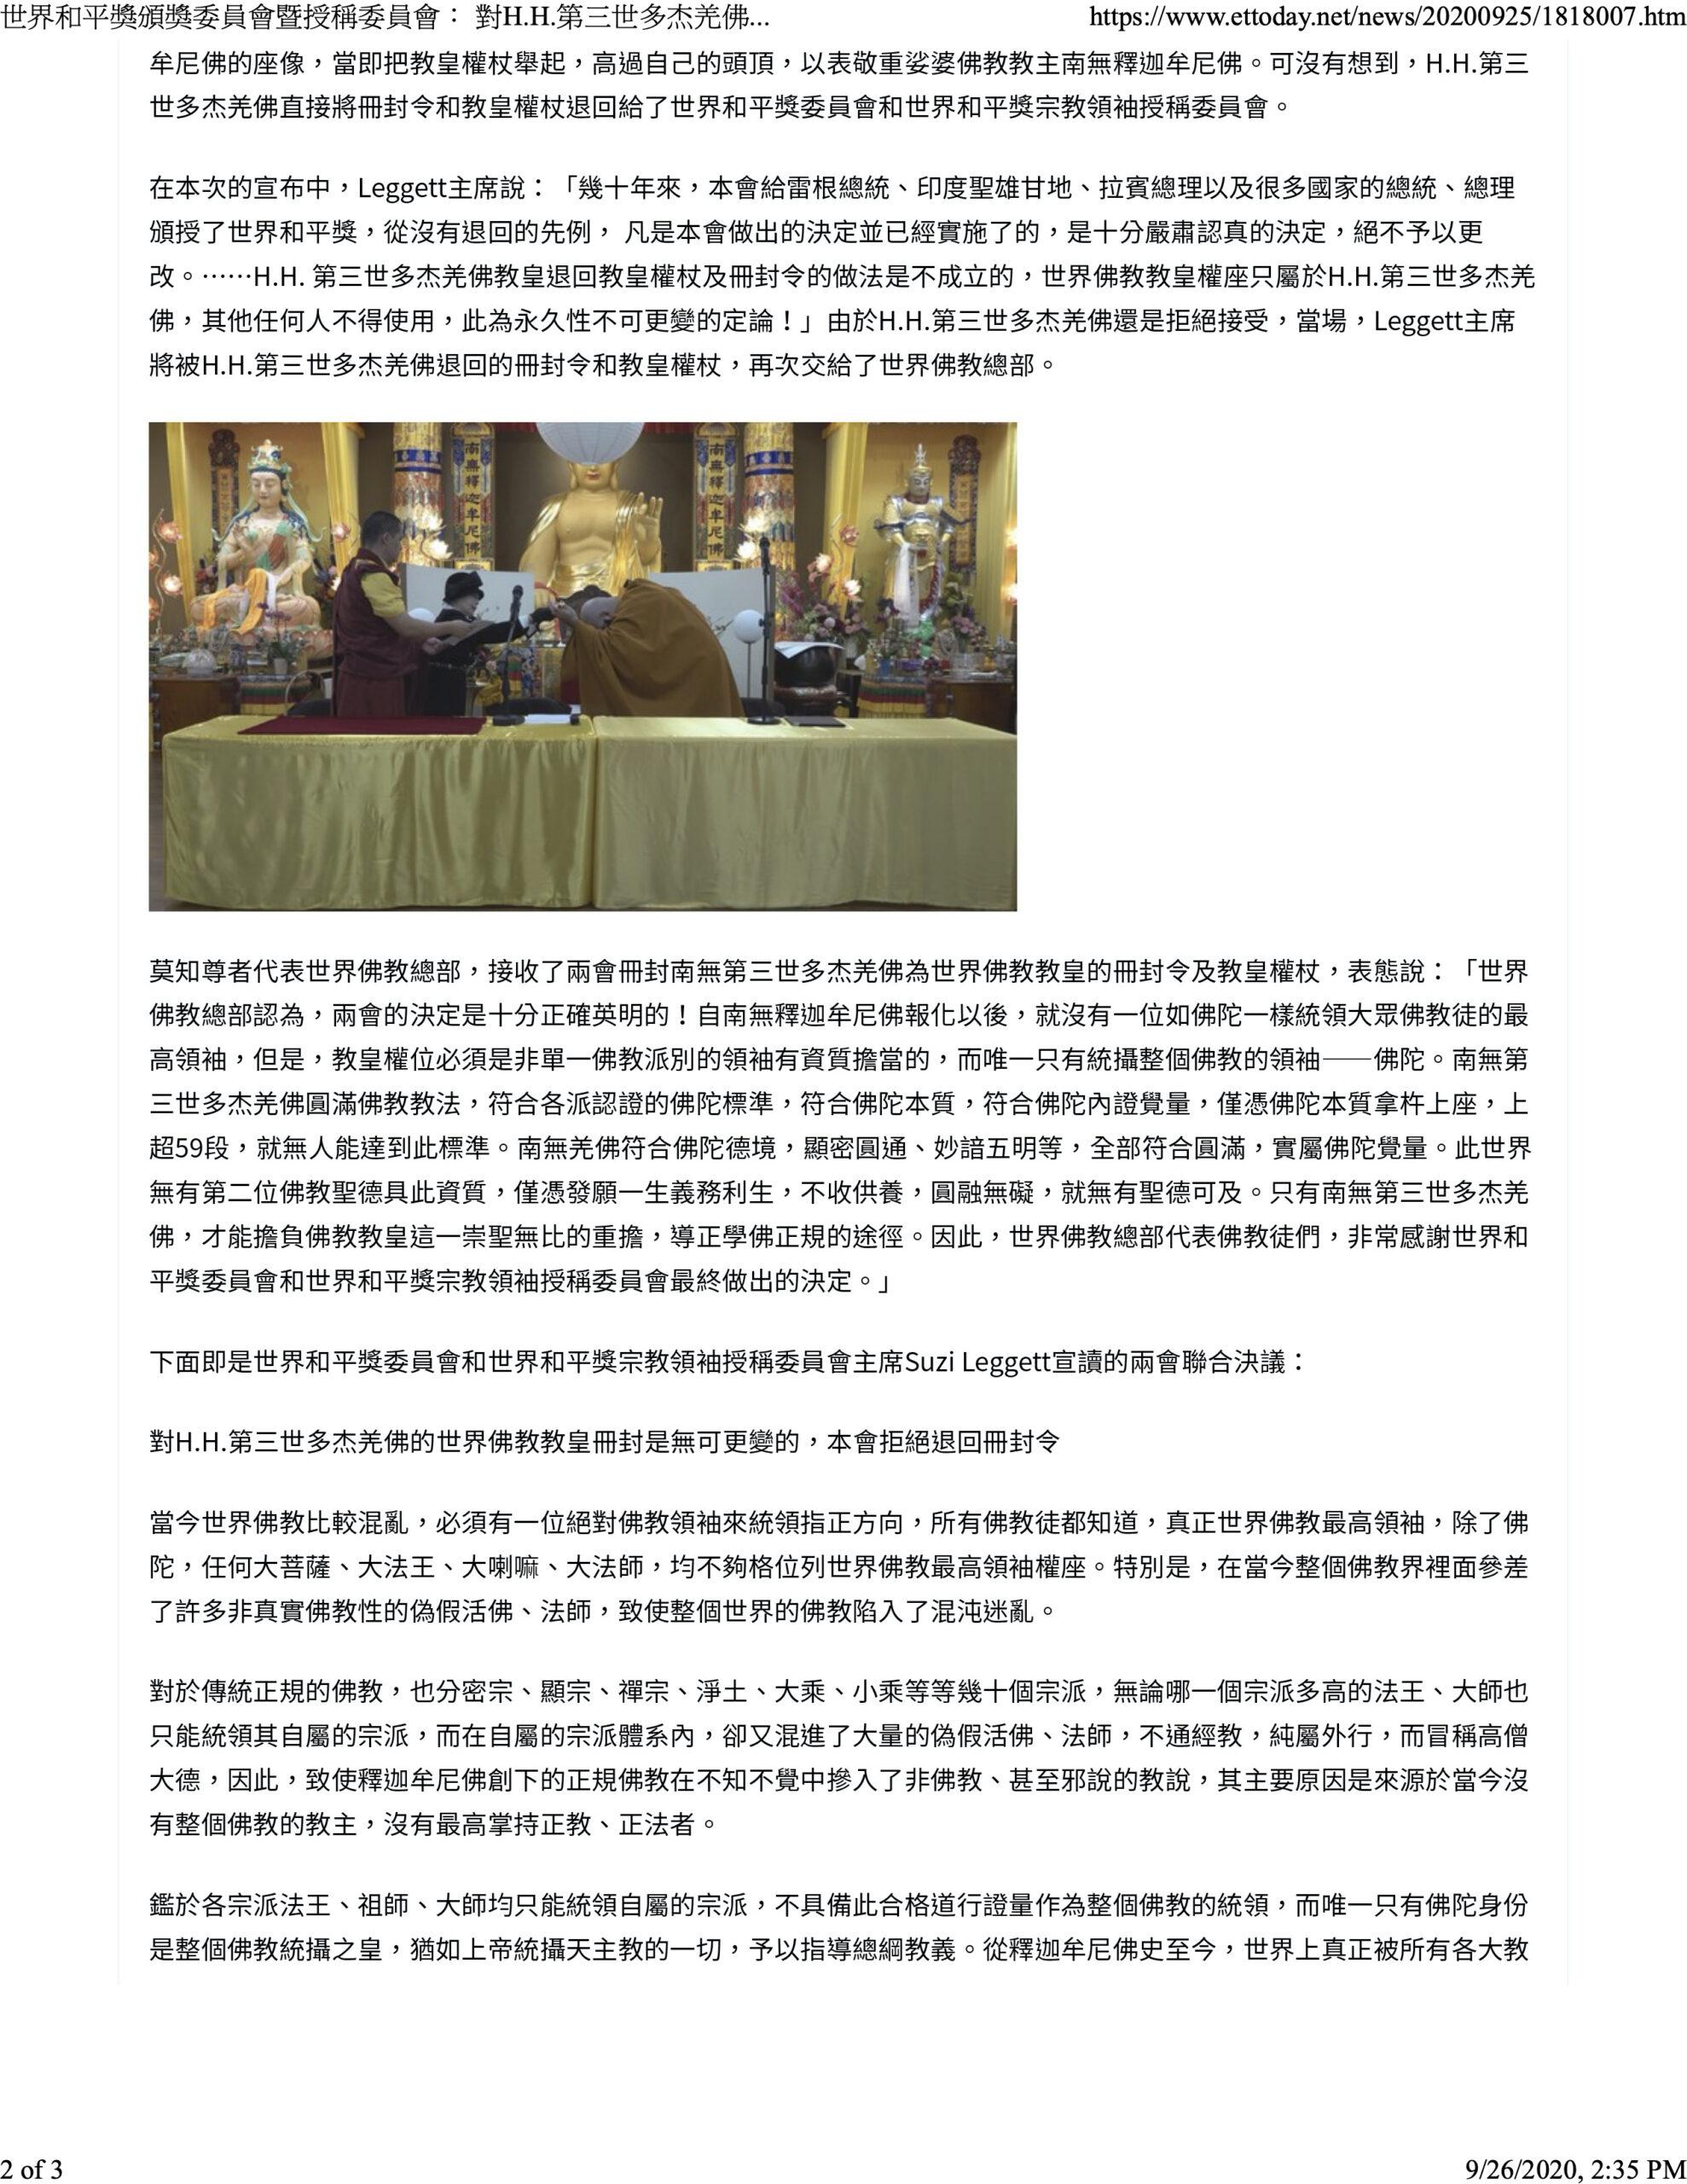 2-2. ETtoday 新聞雲_世界和平獎頒獎委員會暨授稱委員會: 對H.H.第三世多杰羌佛的世界佛教教皇冊封是無可變更的_9-24-2020_直